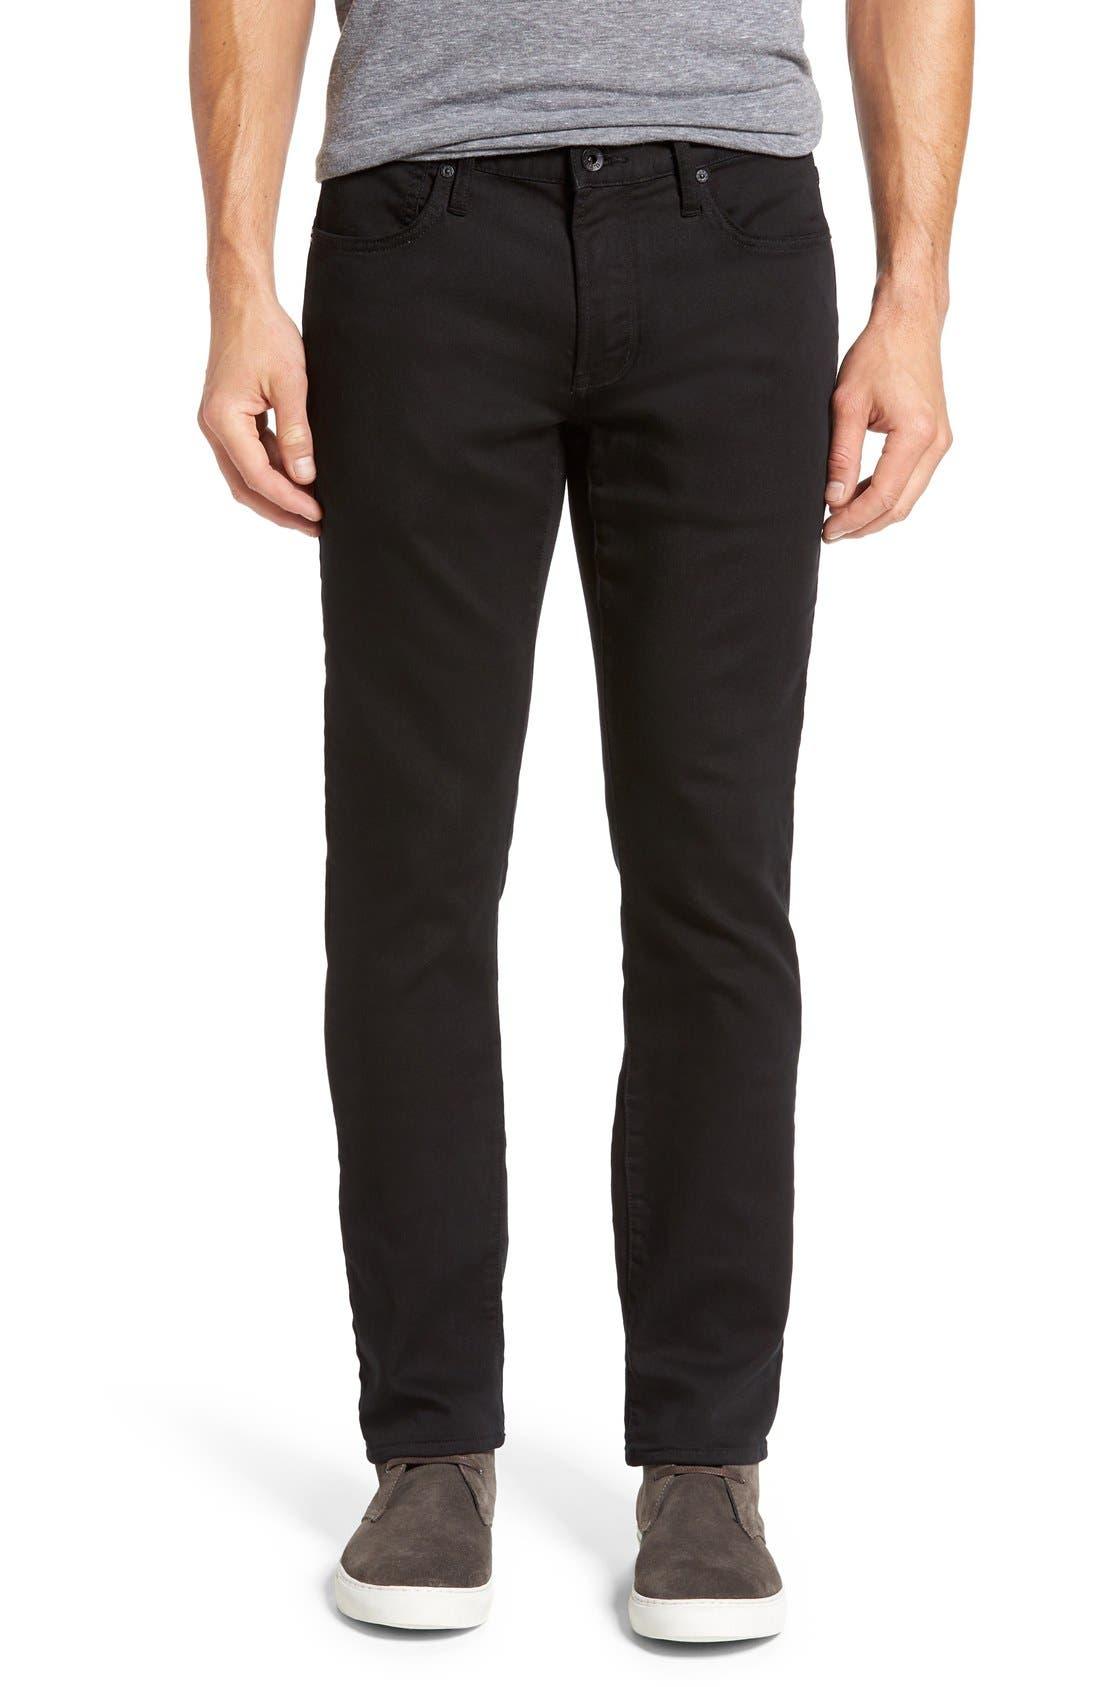 'Bowery' Slim Straight Leg Jeans,                             Main thumbnail 1, color,                             Black